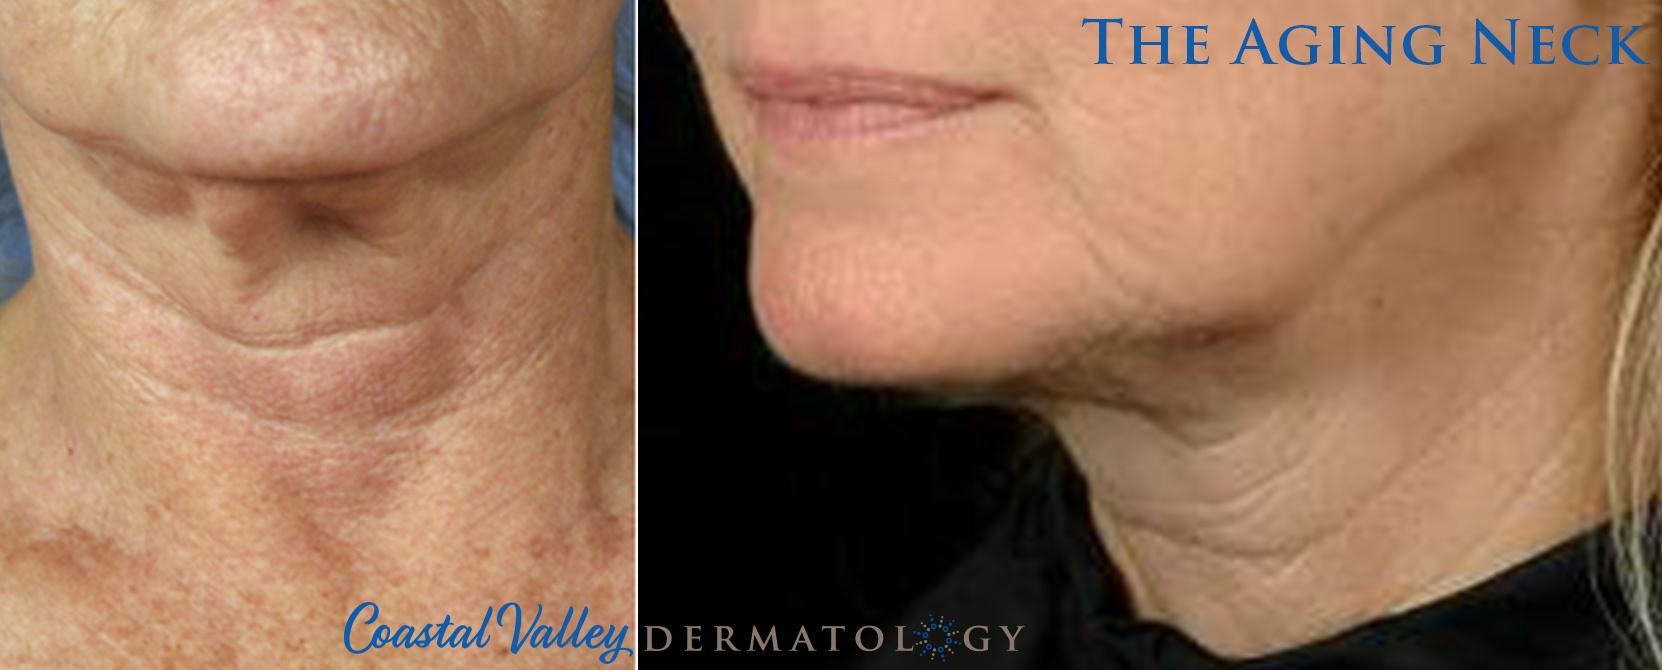 coastal-valley-dermatology-carmel-aging-neck-rejuvenation-photo